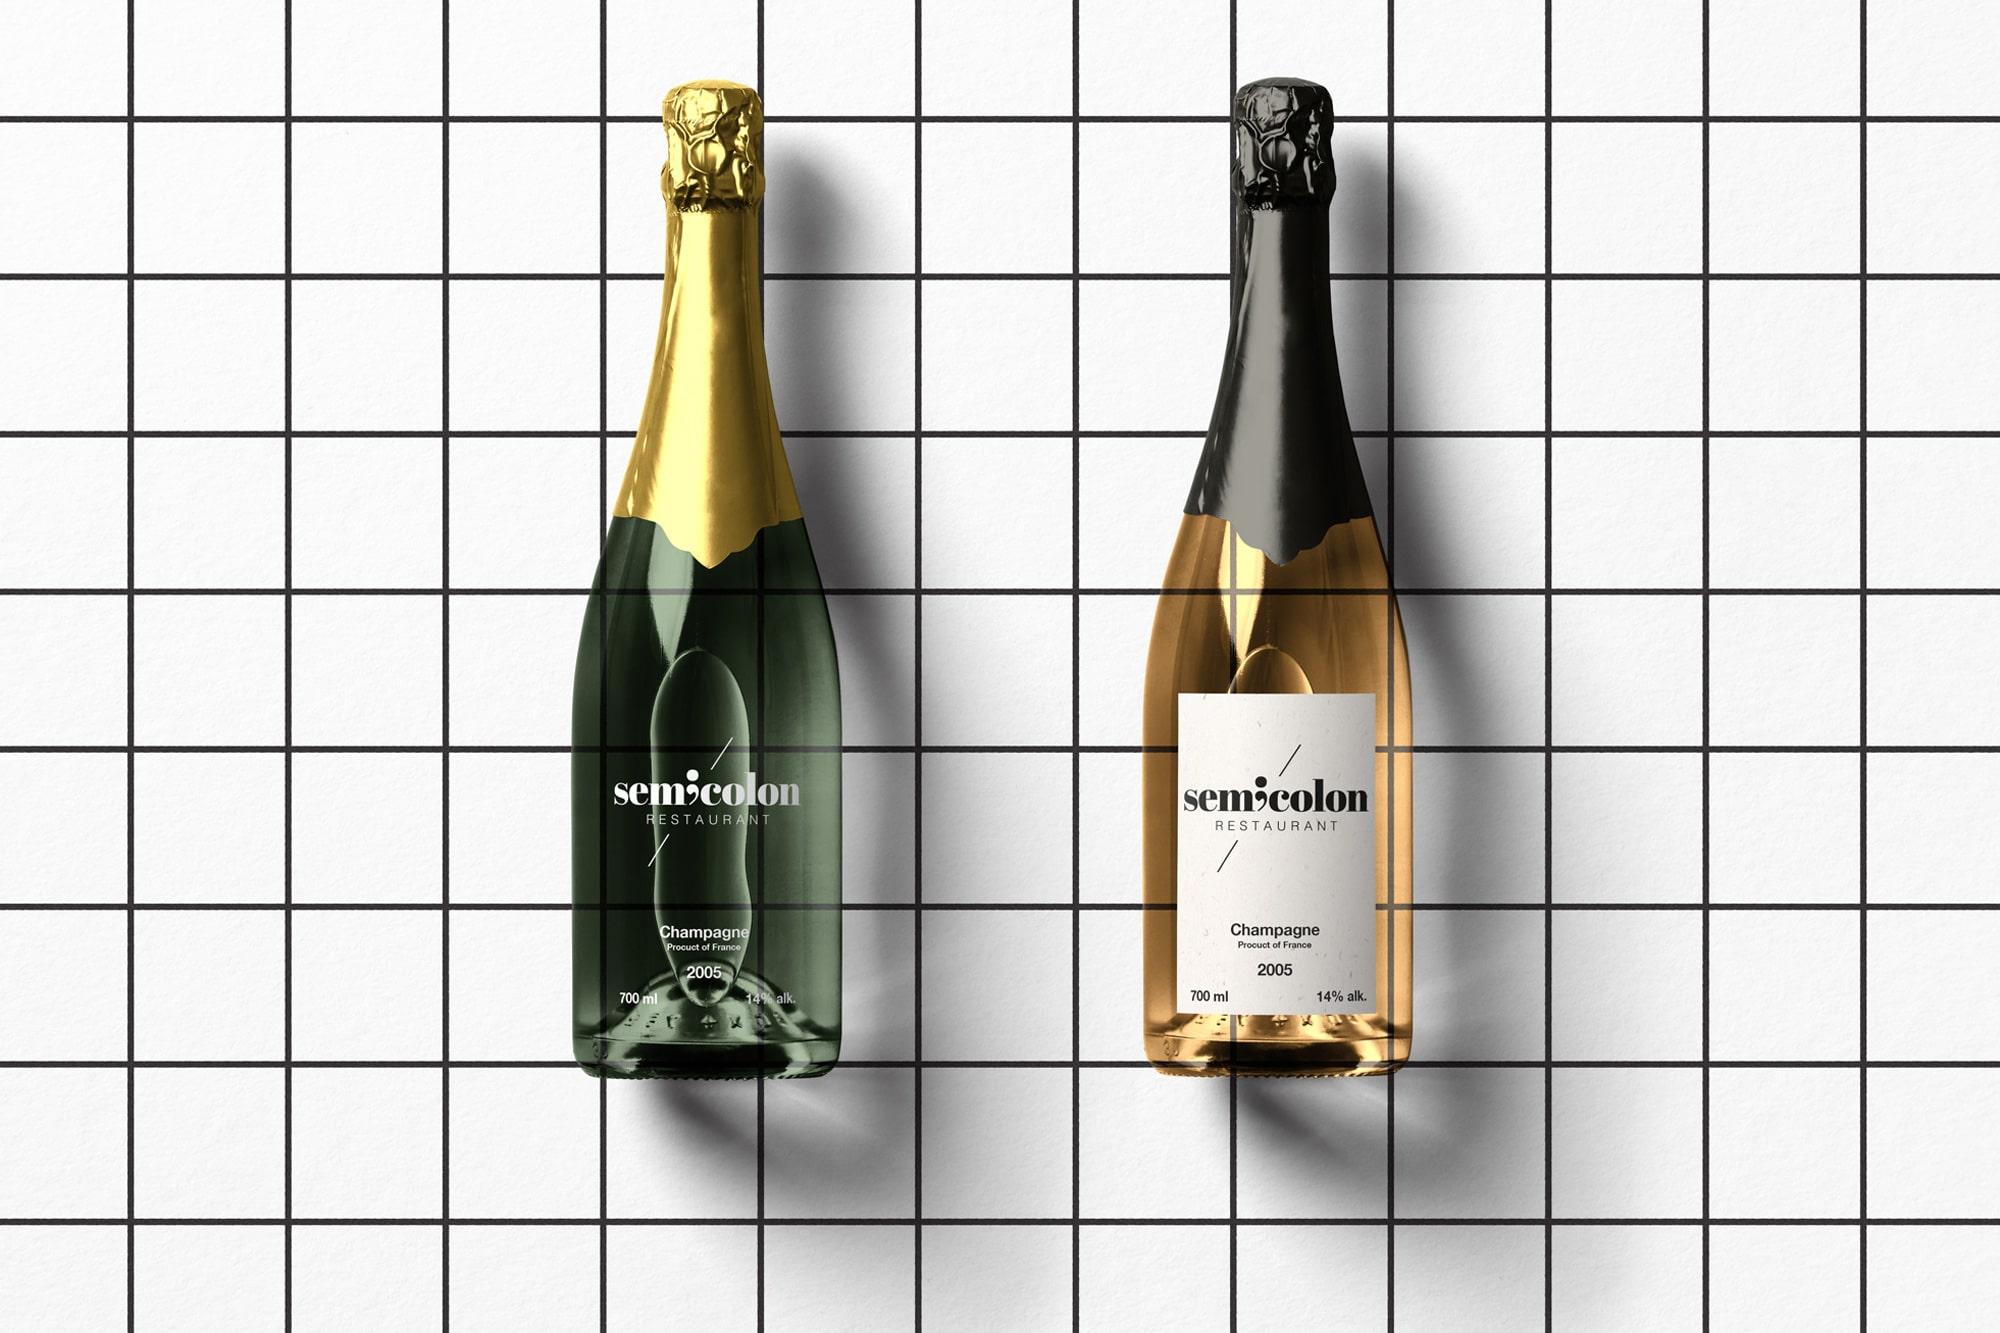 planx-semicolon-ChampagneBottle-Karo